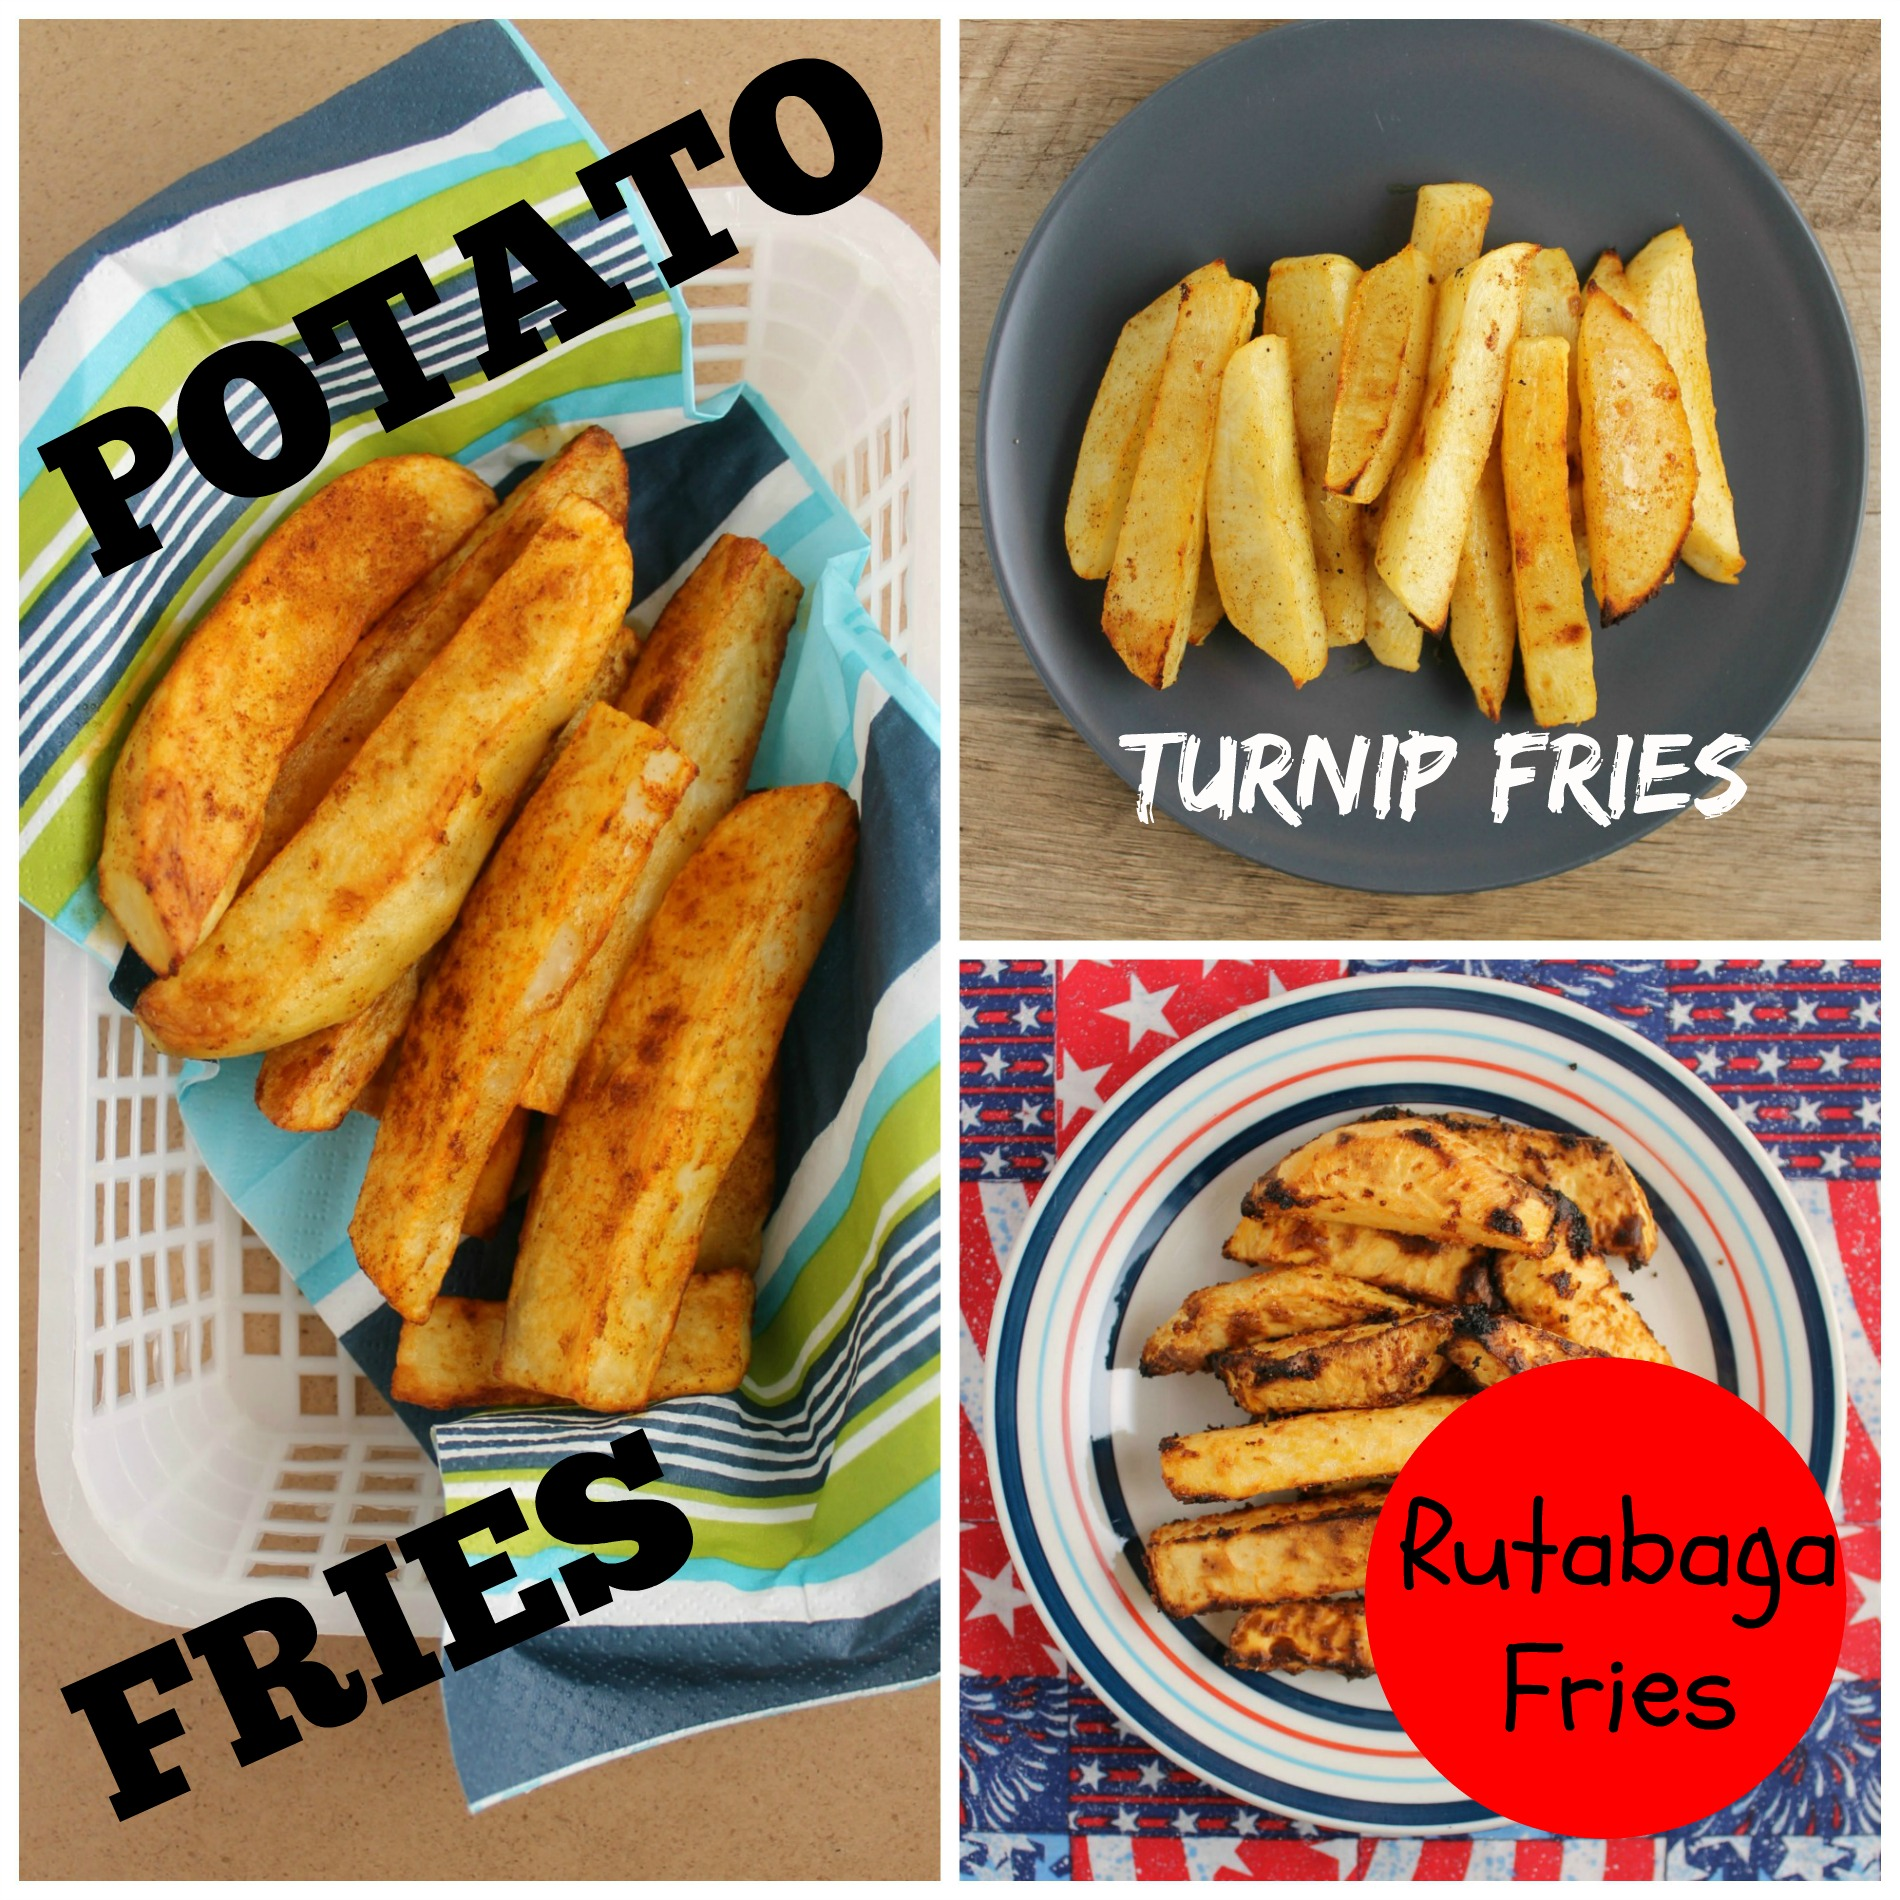 how to cook rutabaga fries